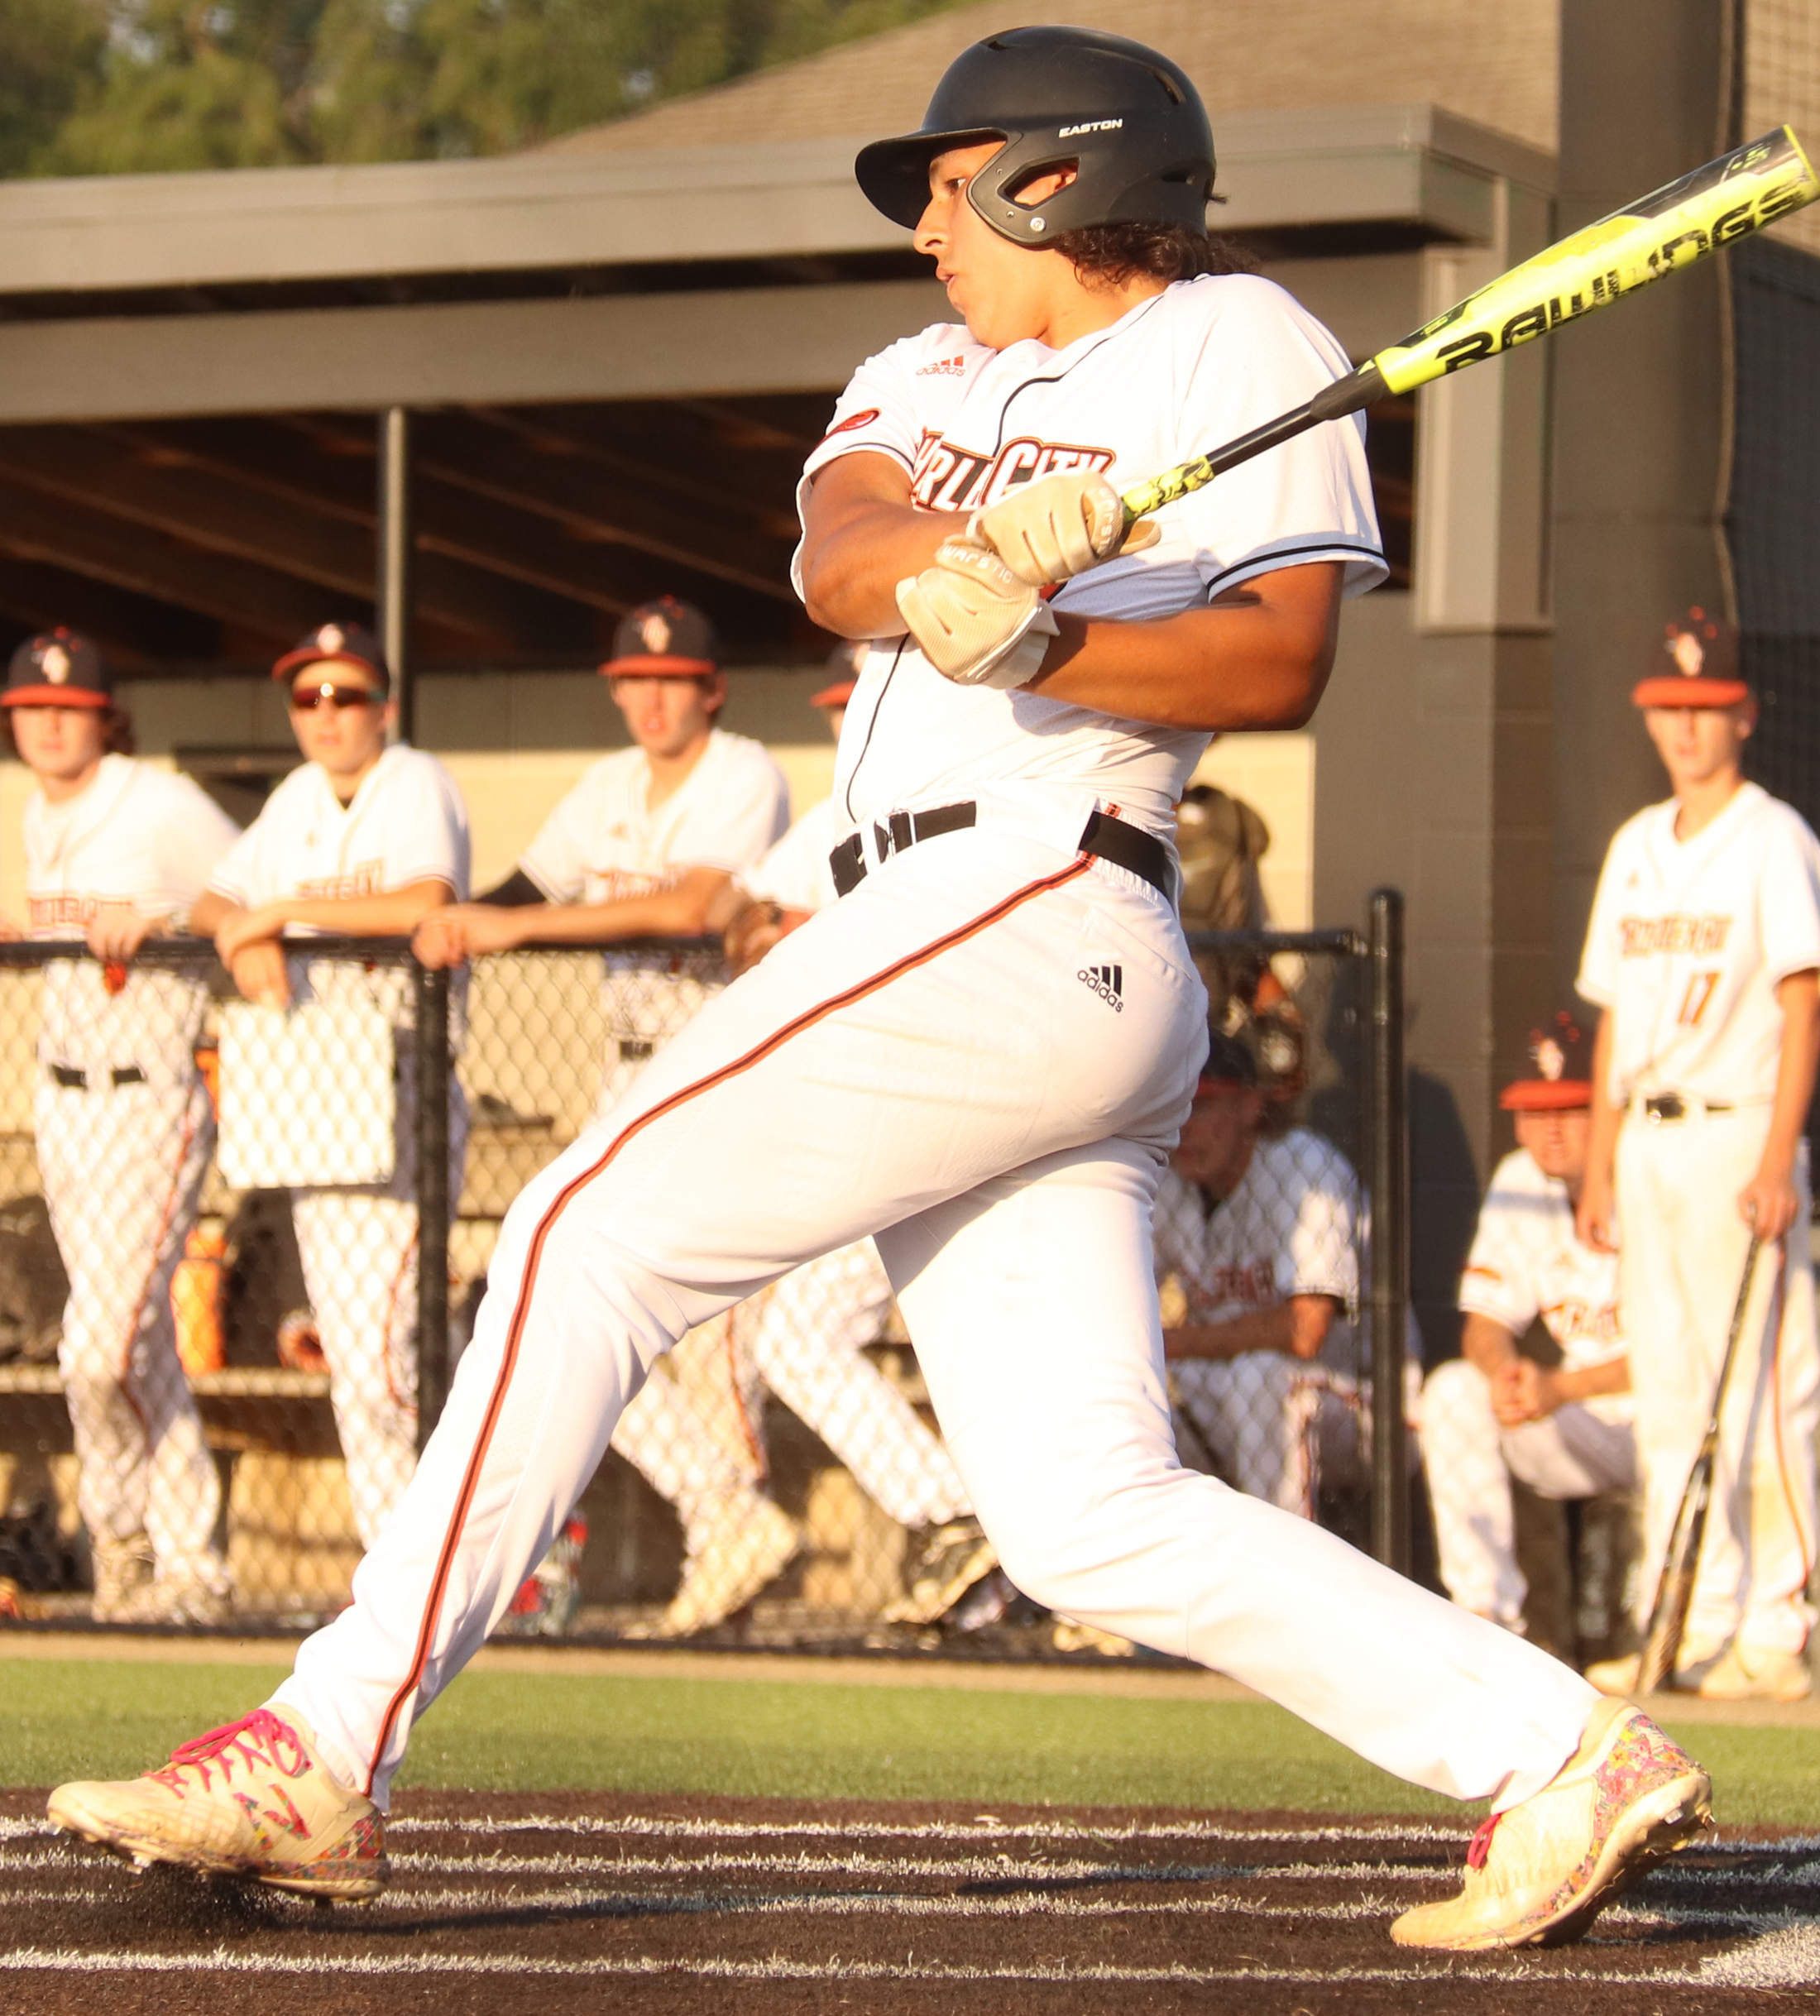 Tino Tamayo named All-NEIC Baseball Honorable Mention